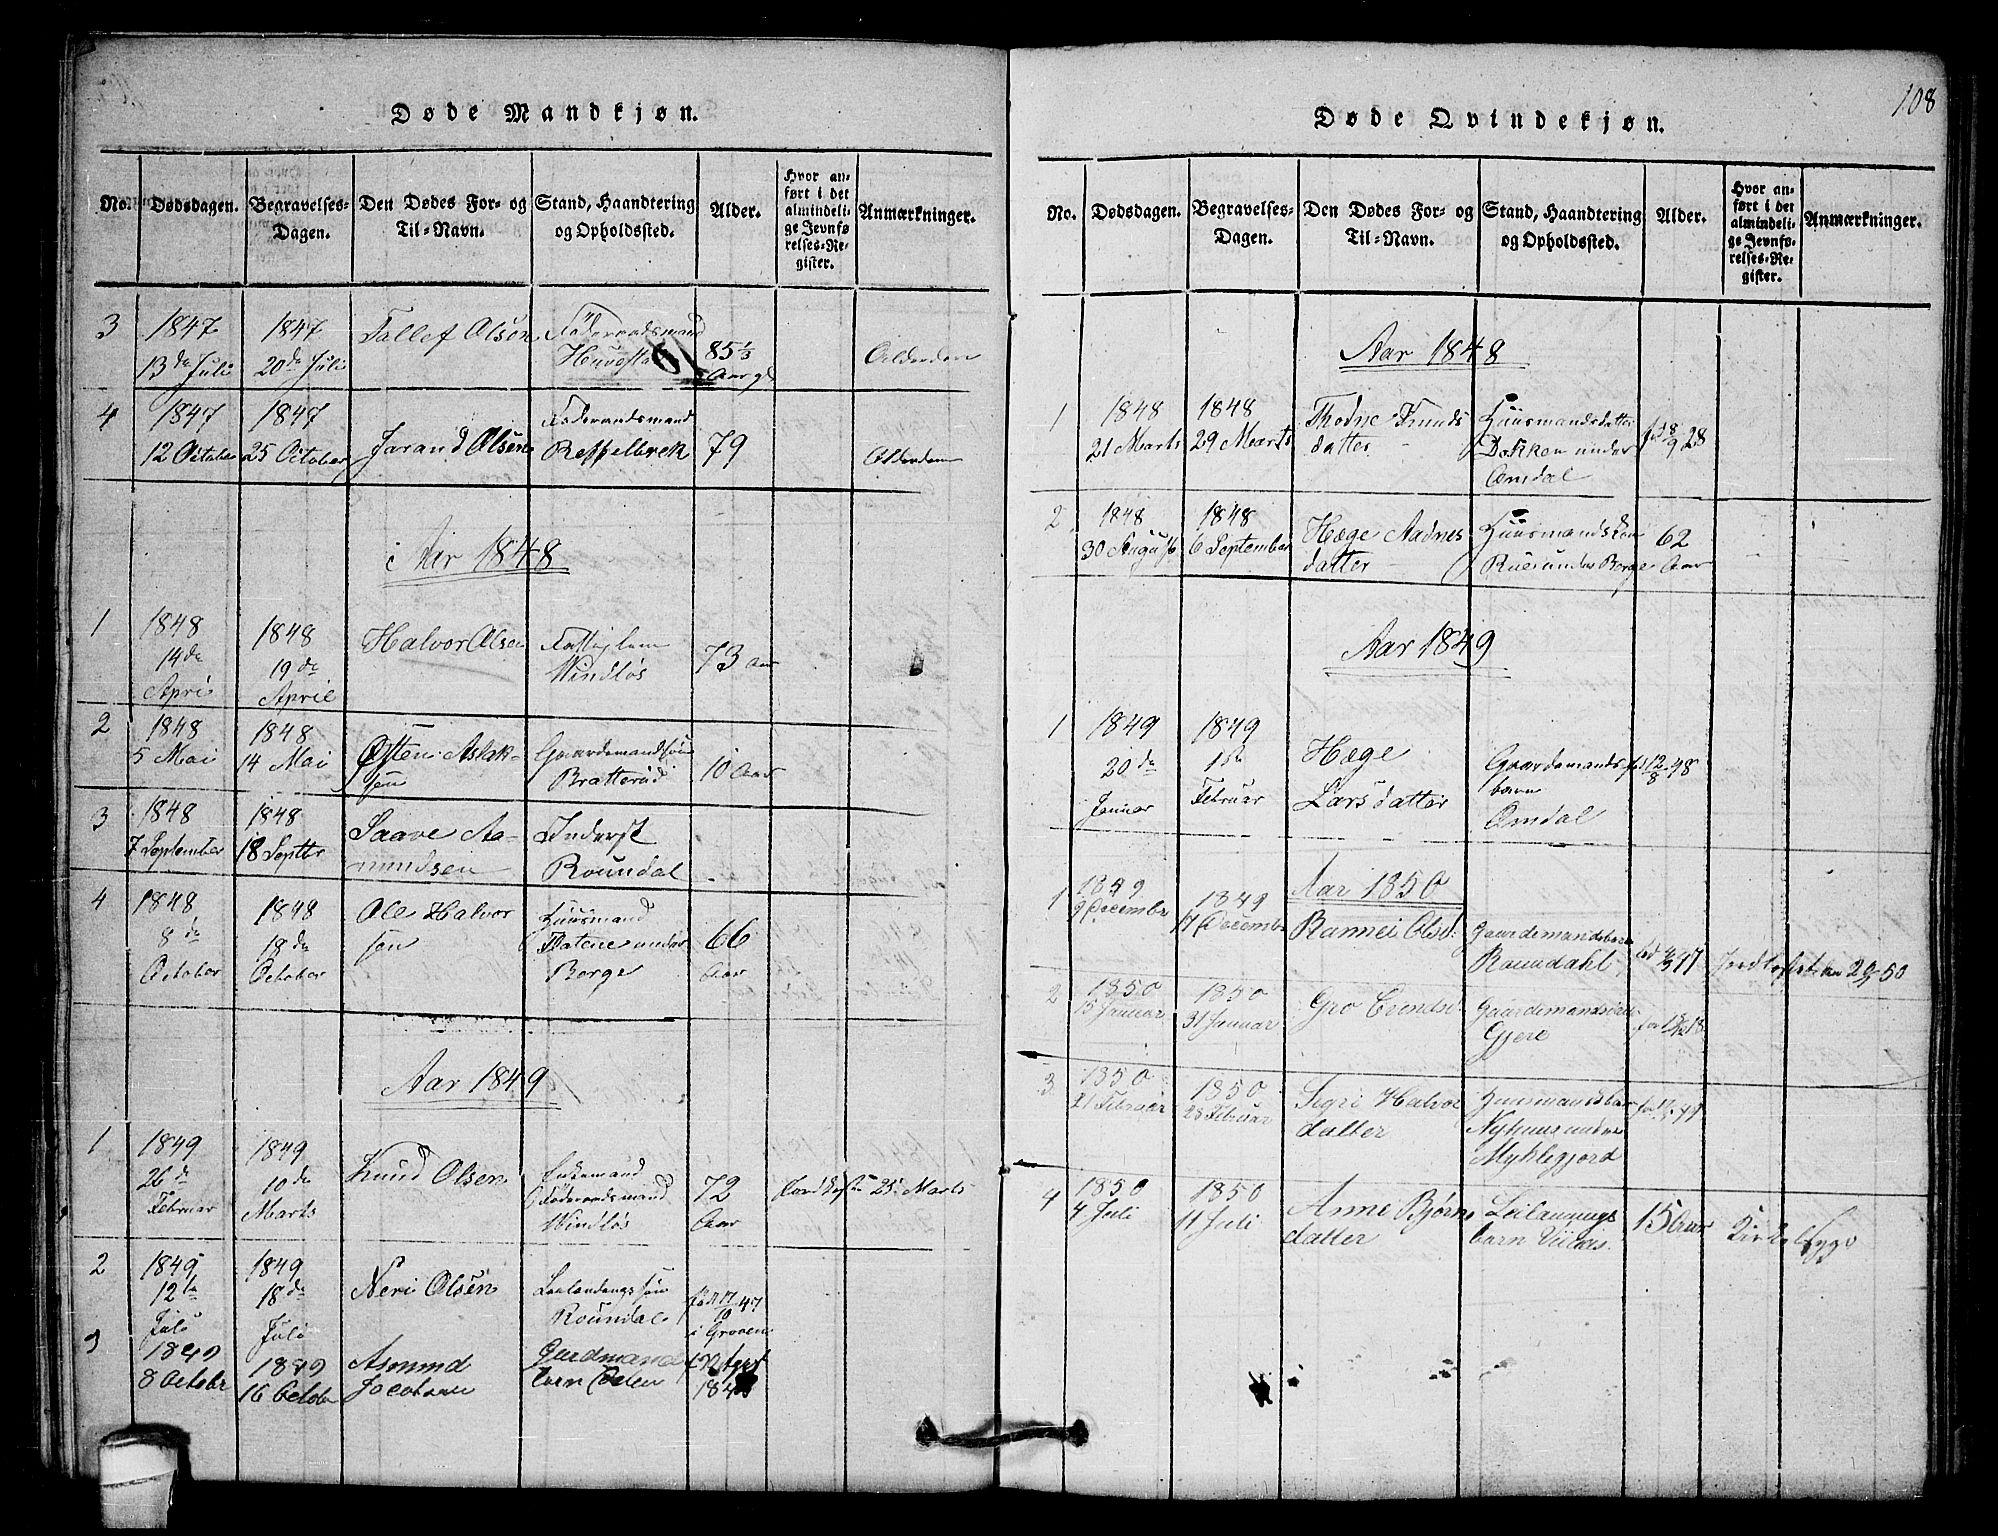 SAKO, Lårdal kirkebøker, G/Gb/L0001: Klokkerbok nr. II 1, 1815-1865, s. 108